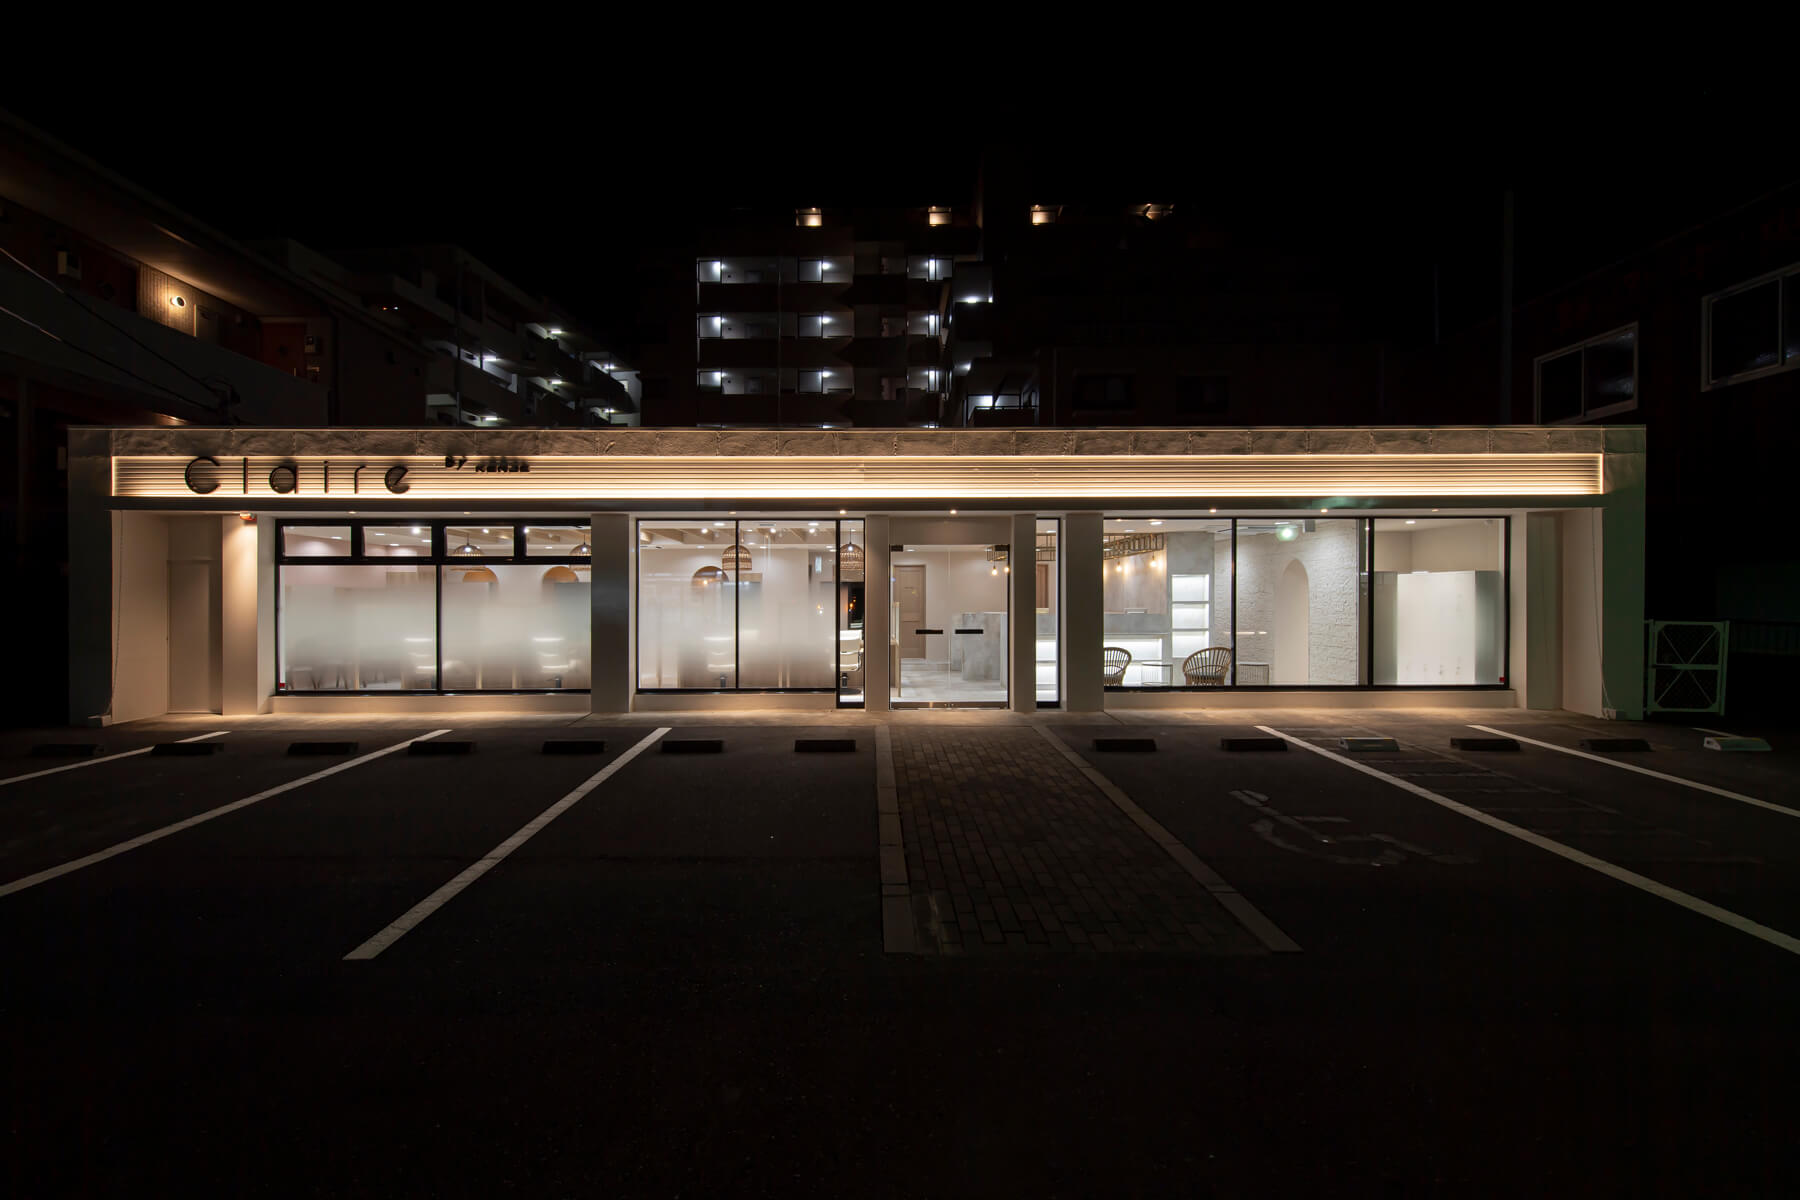 Claire by KENJE/Kanagawa